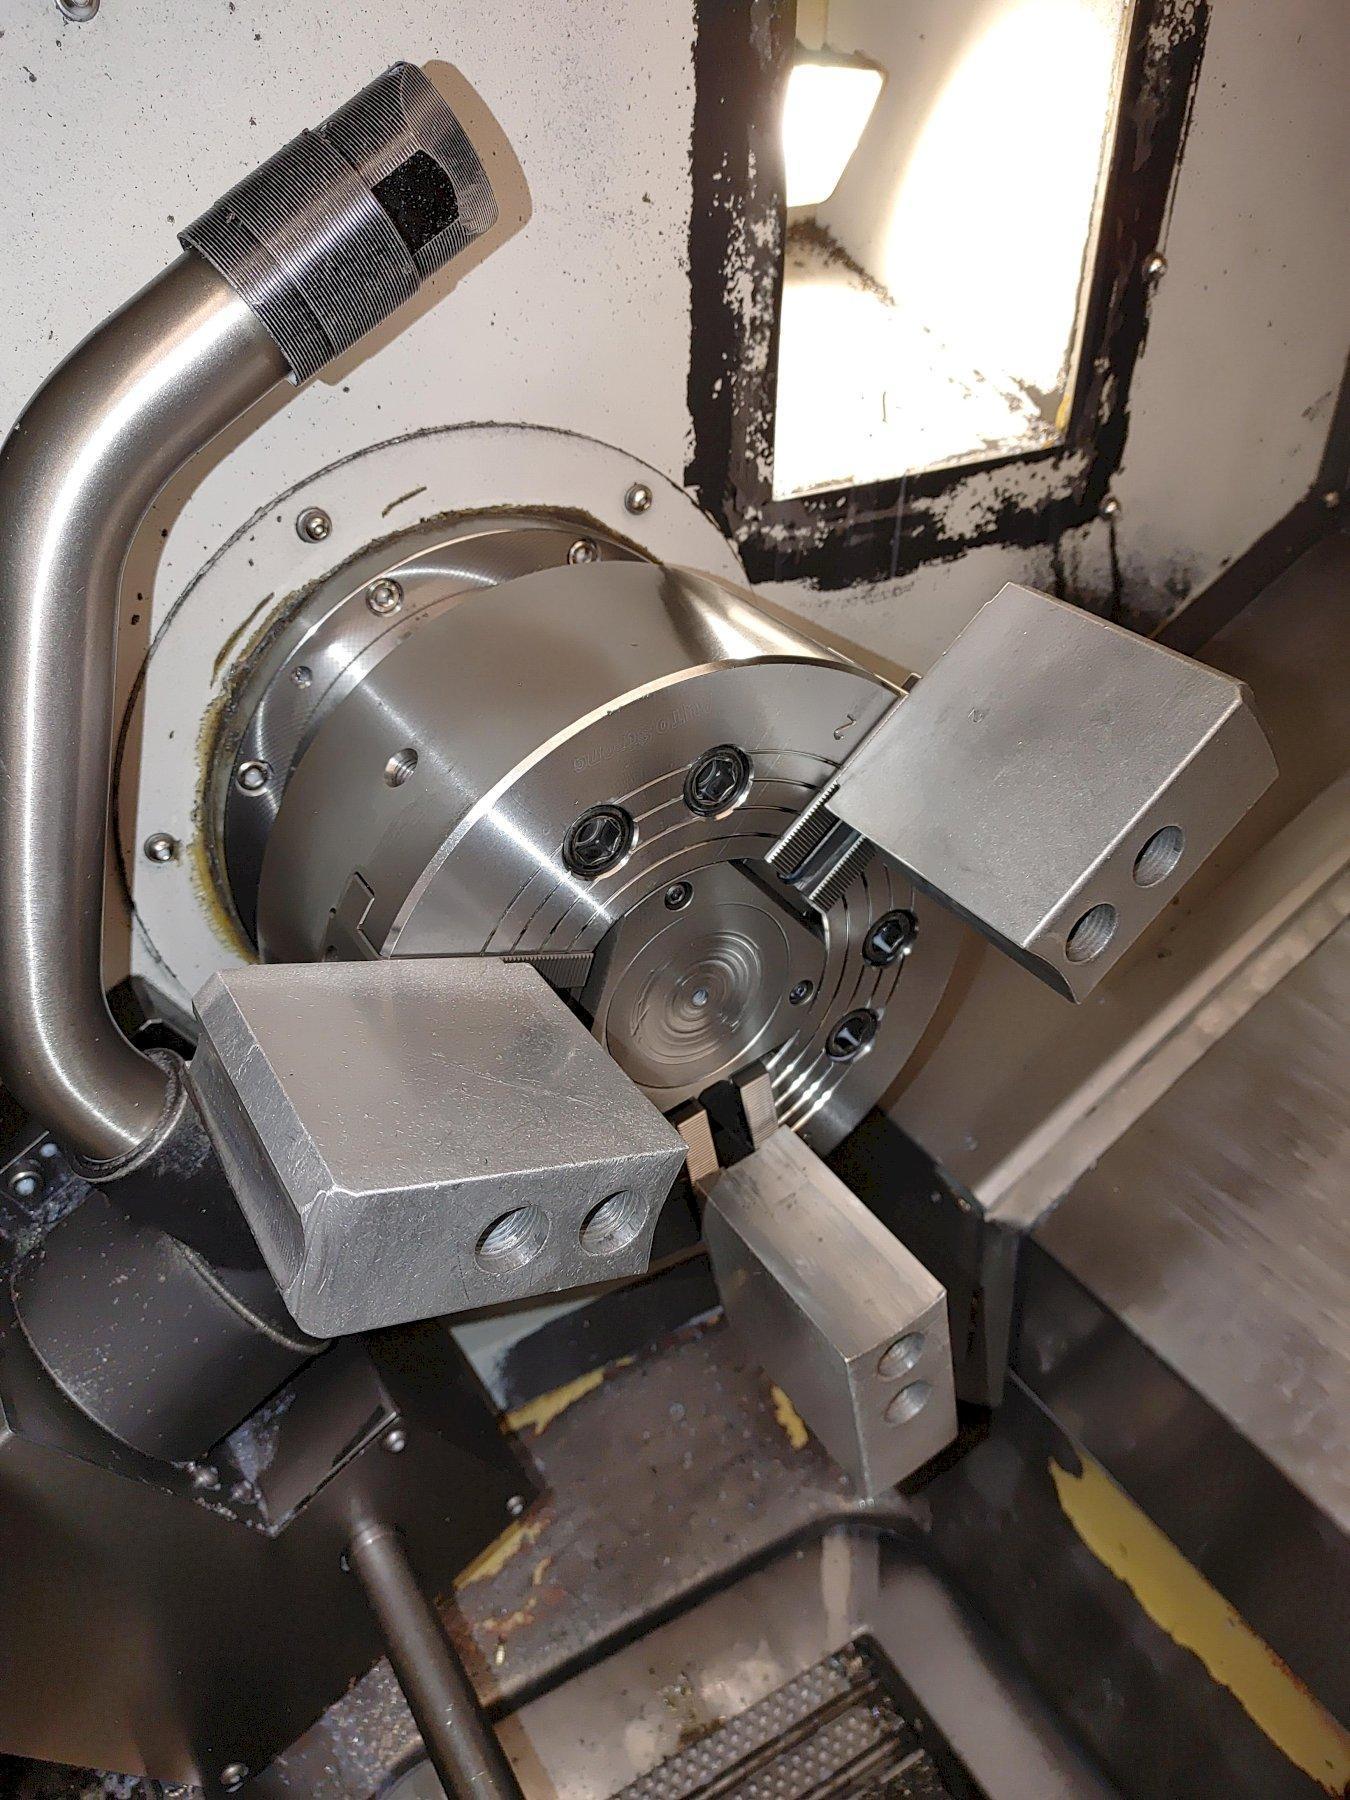 Milltronics SL10 Turning Center, New 2006.